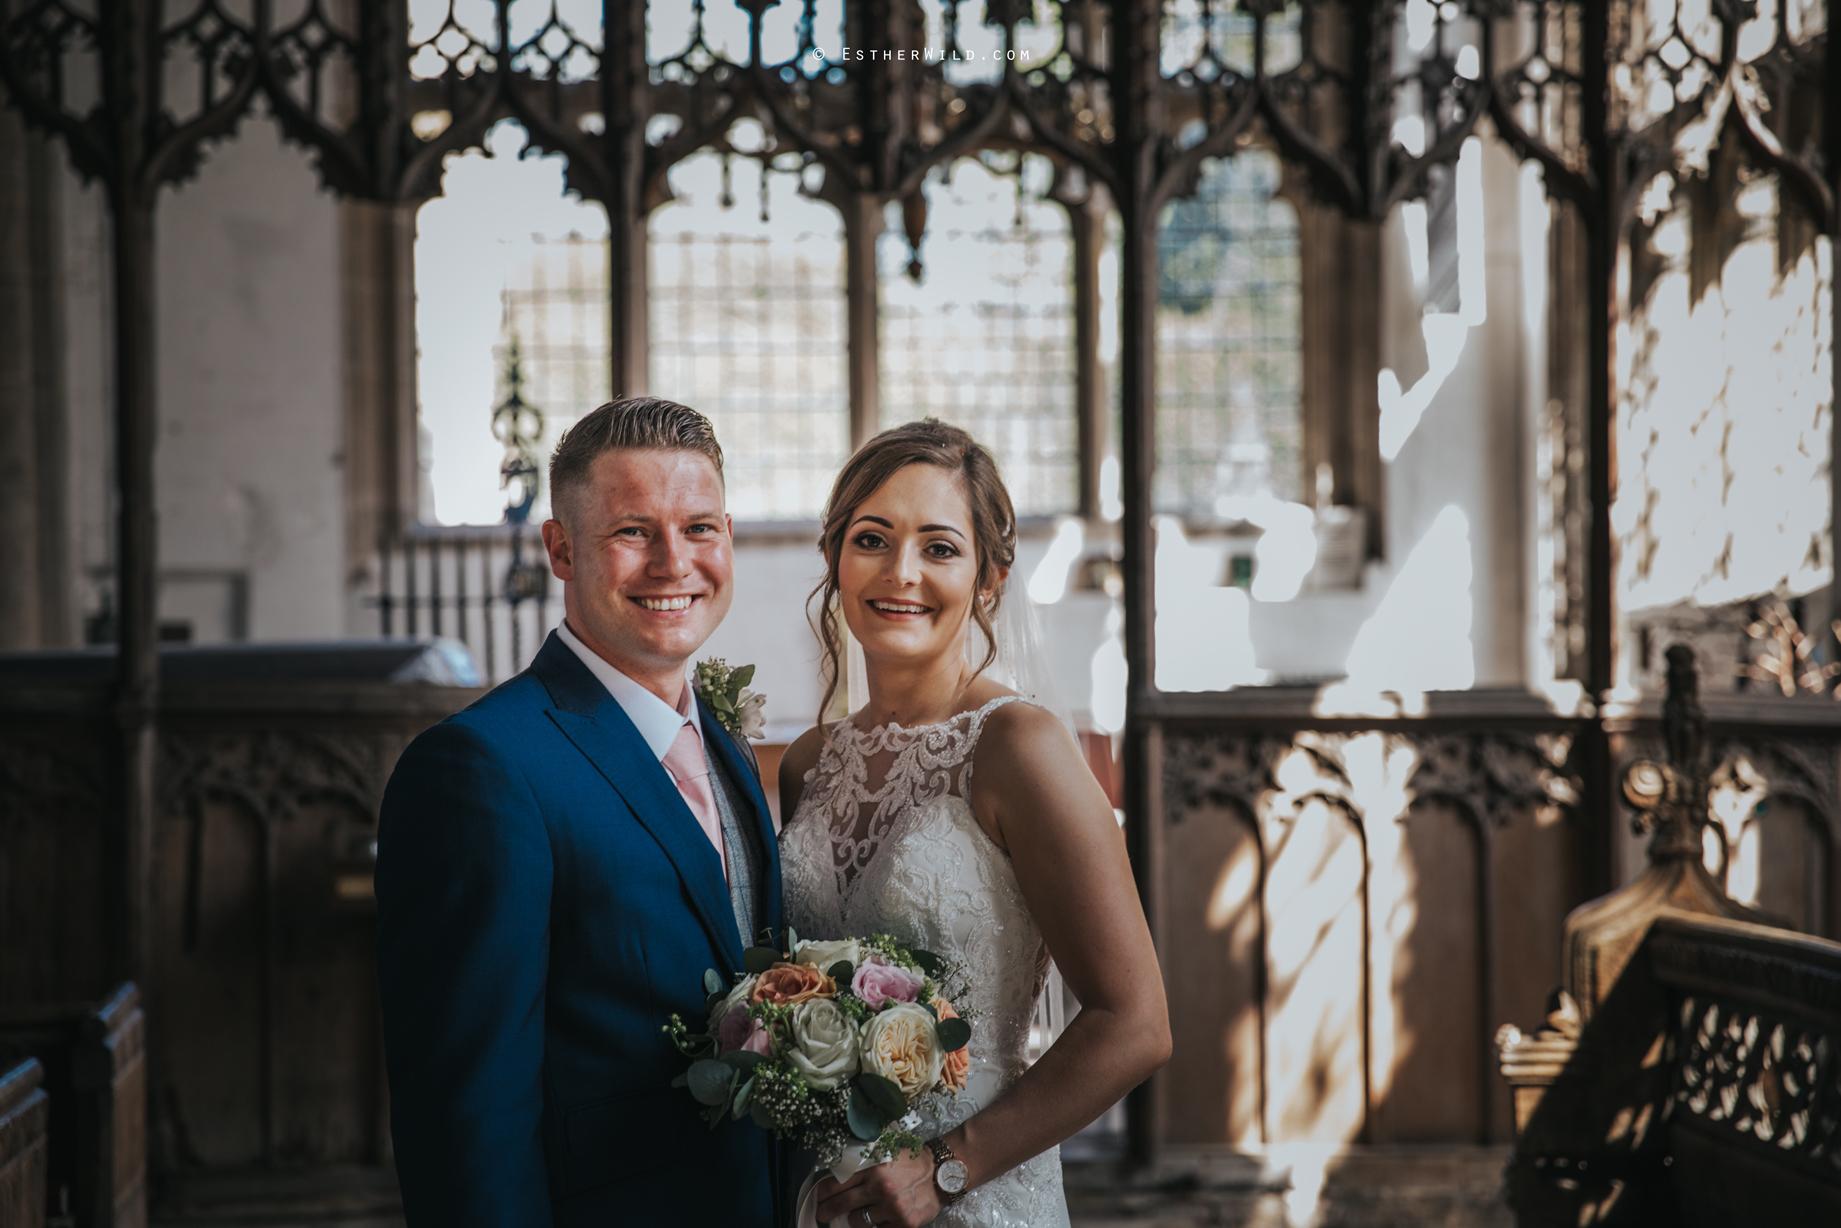 IMG_0915Walpole_St_Andrew_Church_Norfolk_Wedding_Copyright_Esther_Wild_Photographer_.jpg